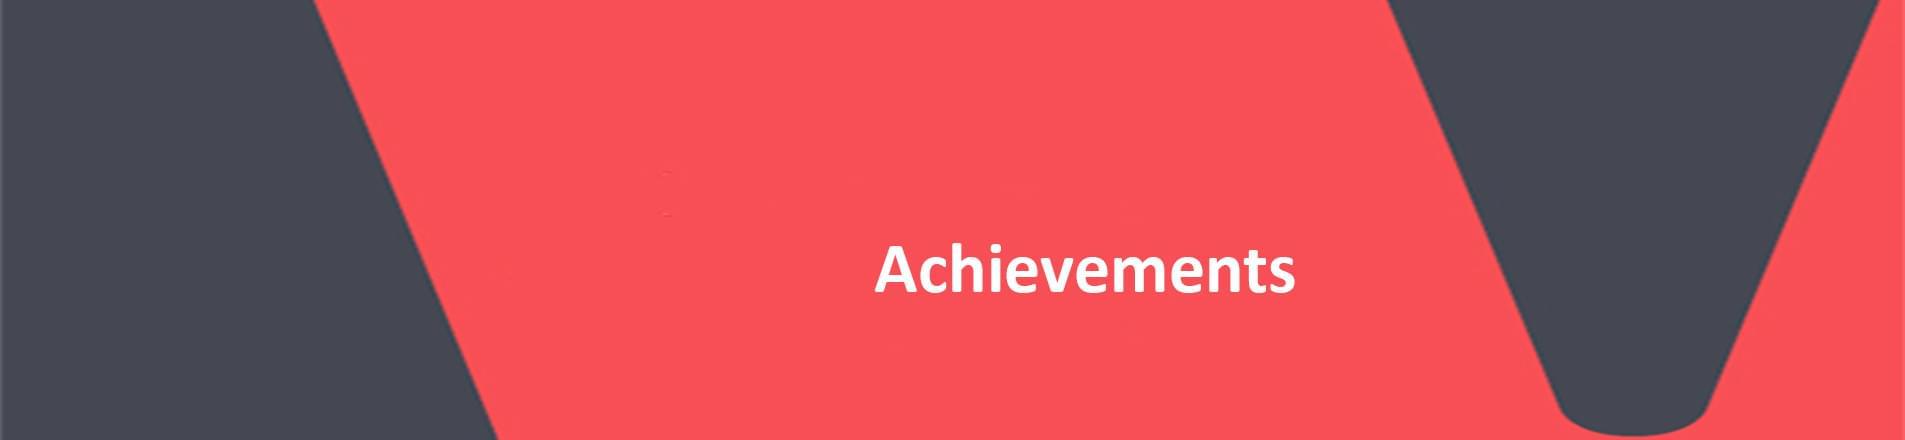 Word Achievement on red VERCIDA branded background